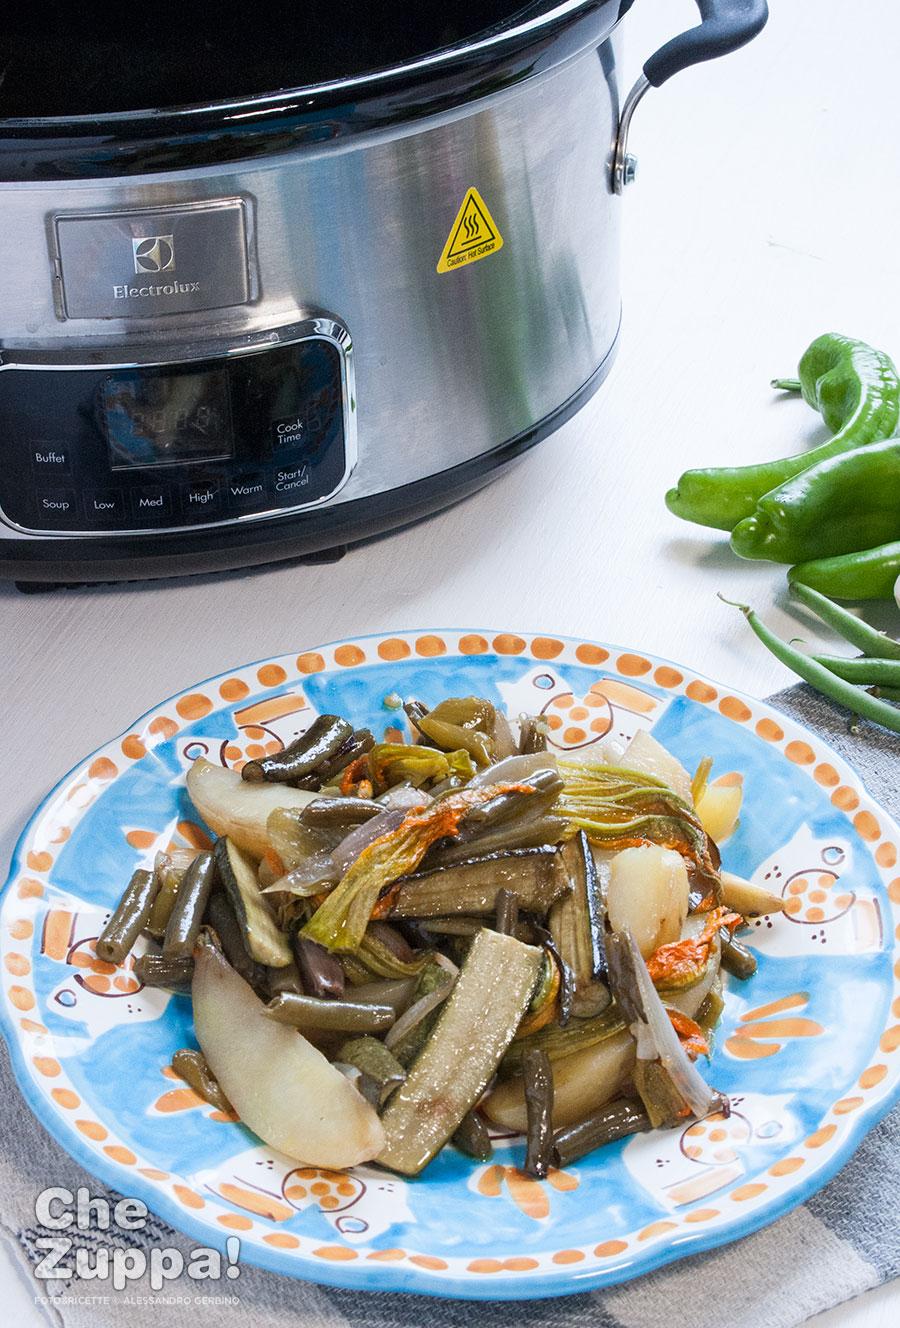 Ciambotta cilentana con Slow Cooker Electrolux